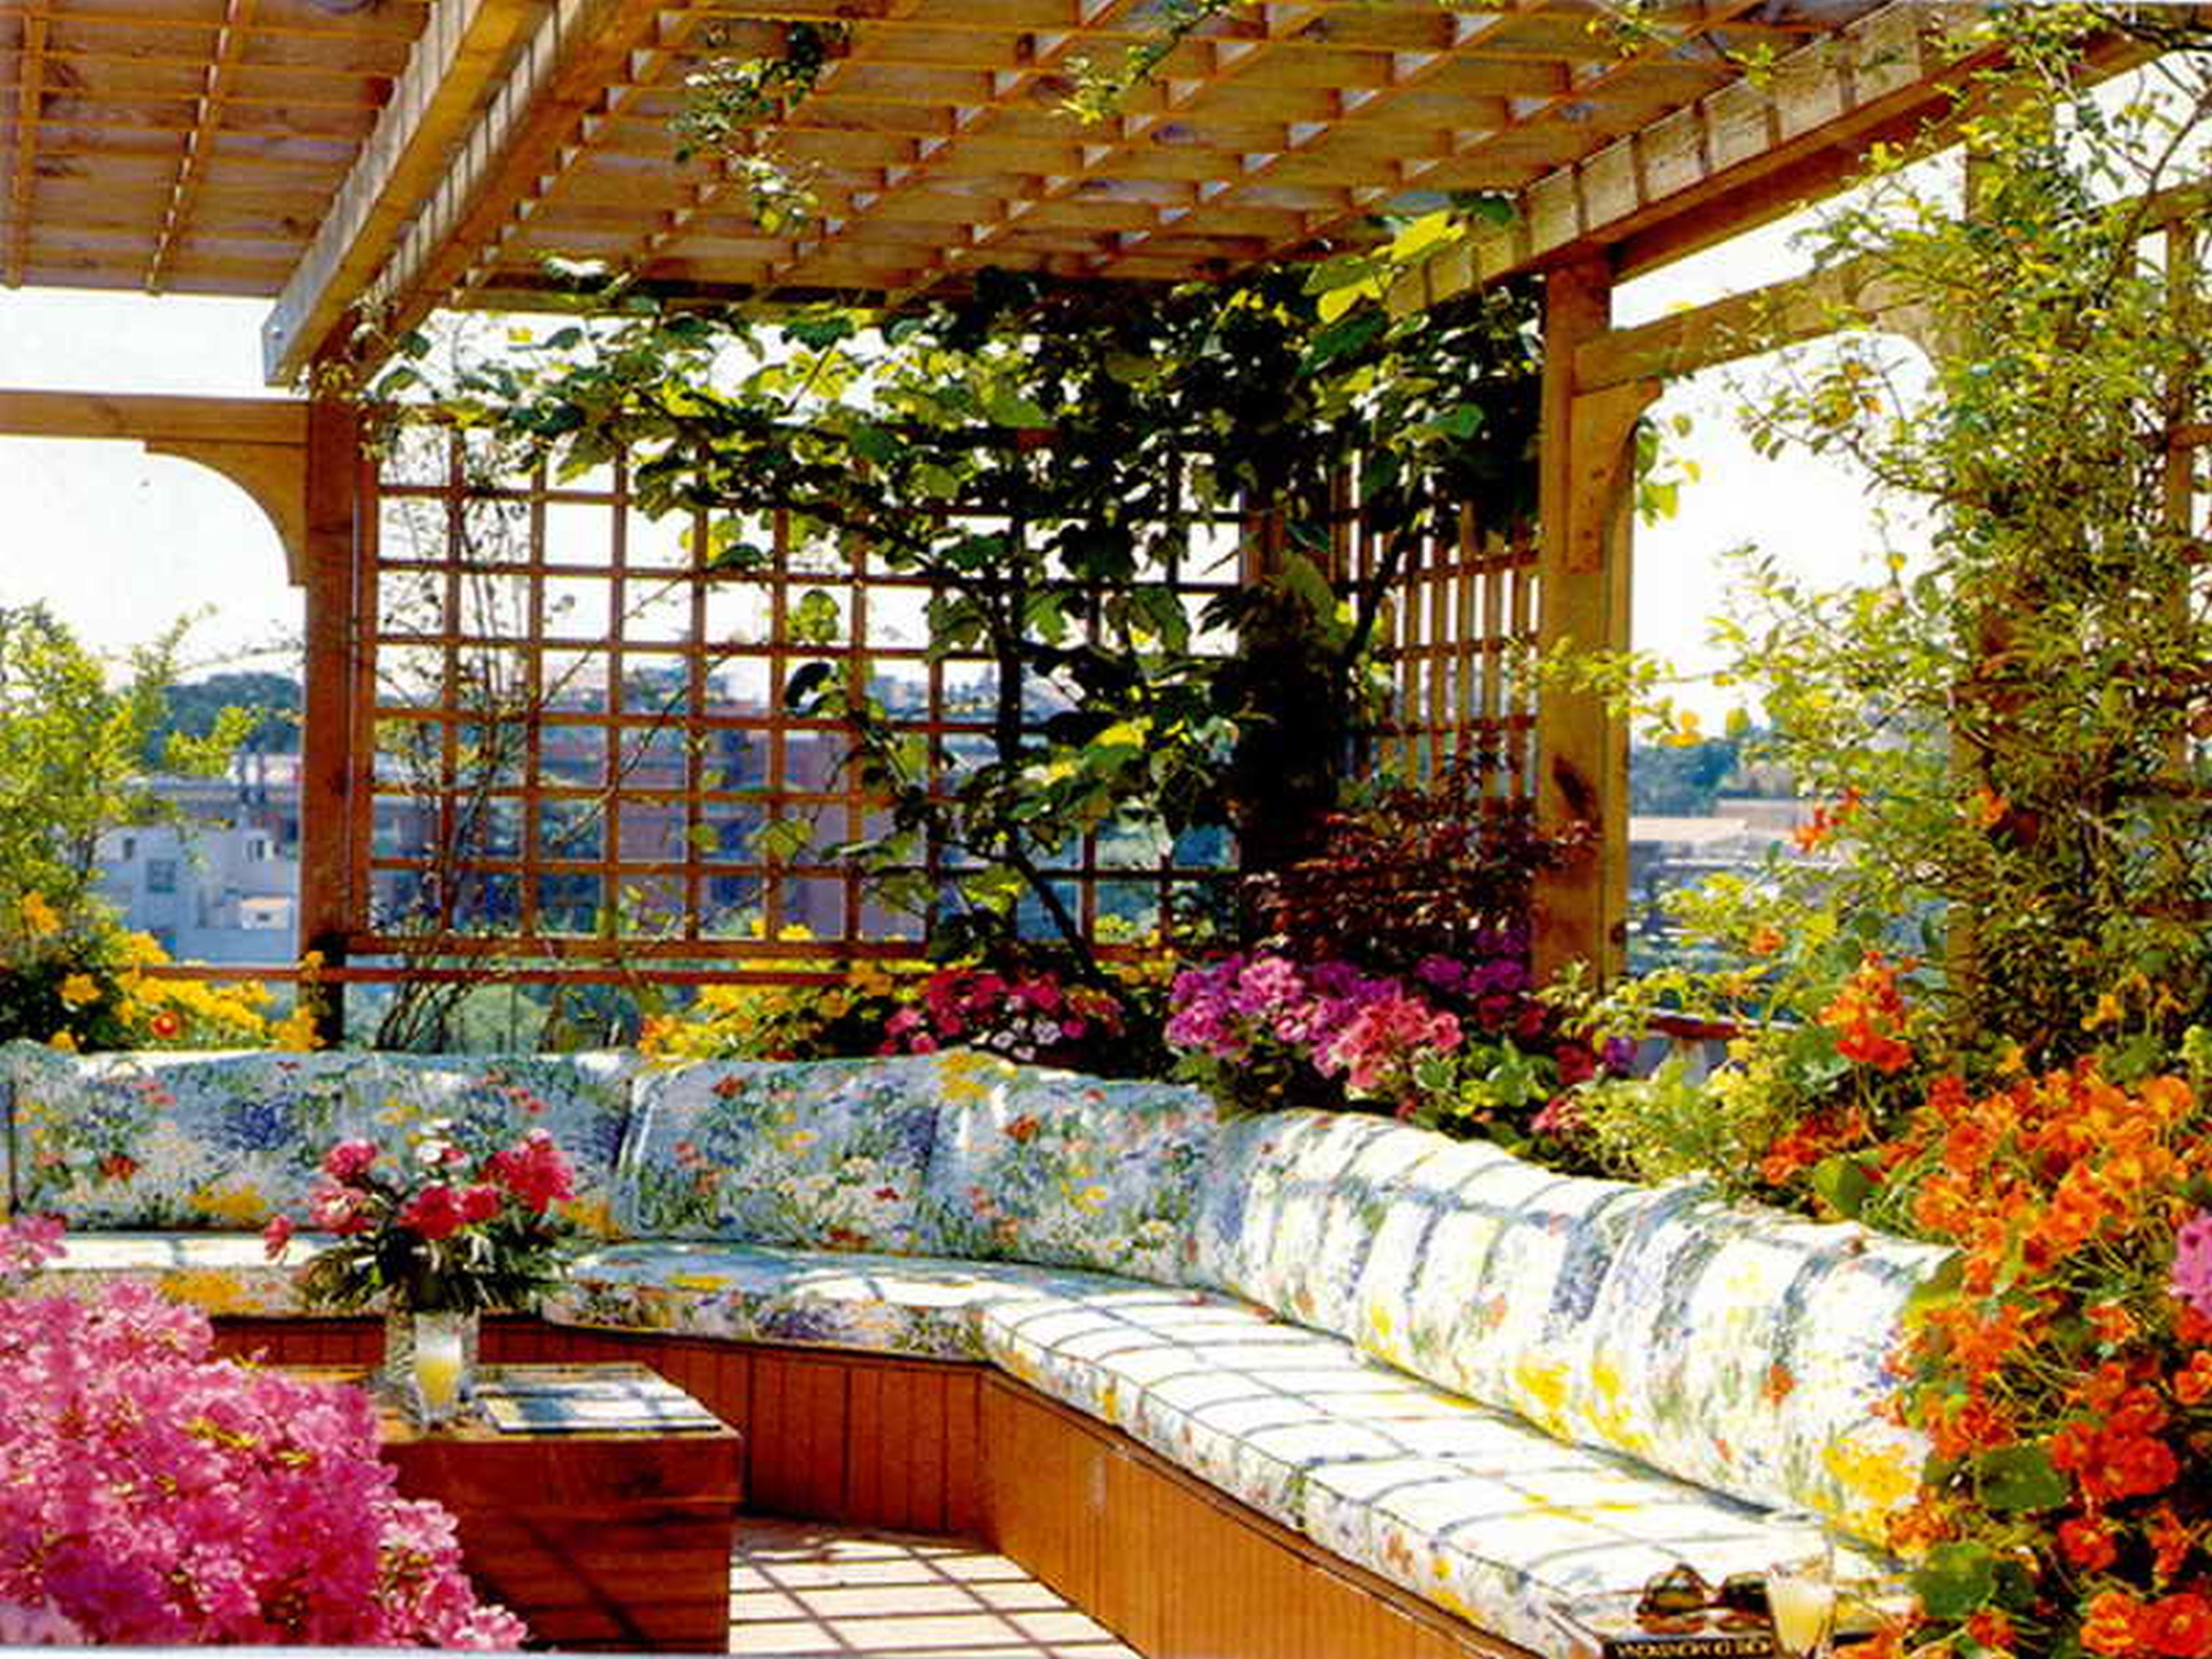 rooftop flower gardens photo - 1